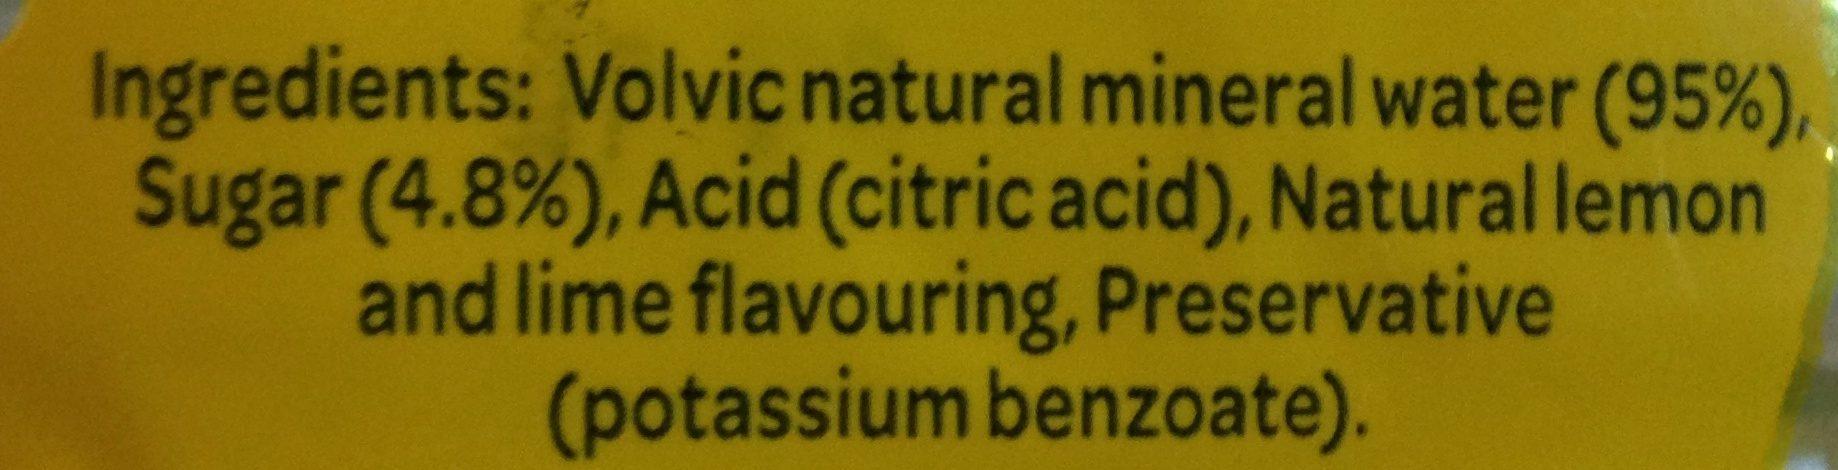 Volvic Touch Of Fruit Lemon & Lime - Ingrédients